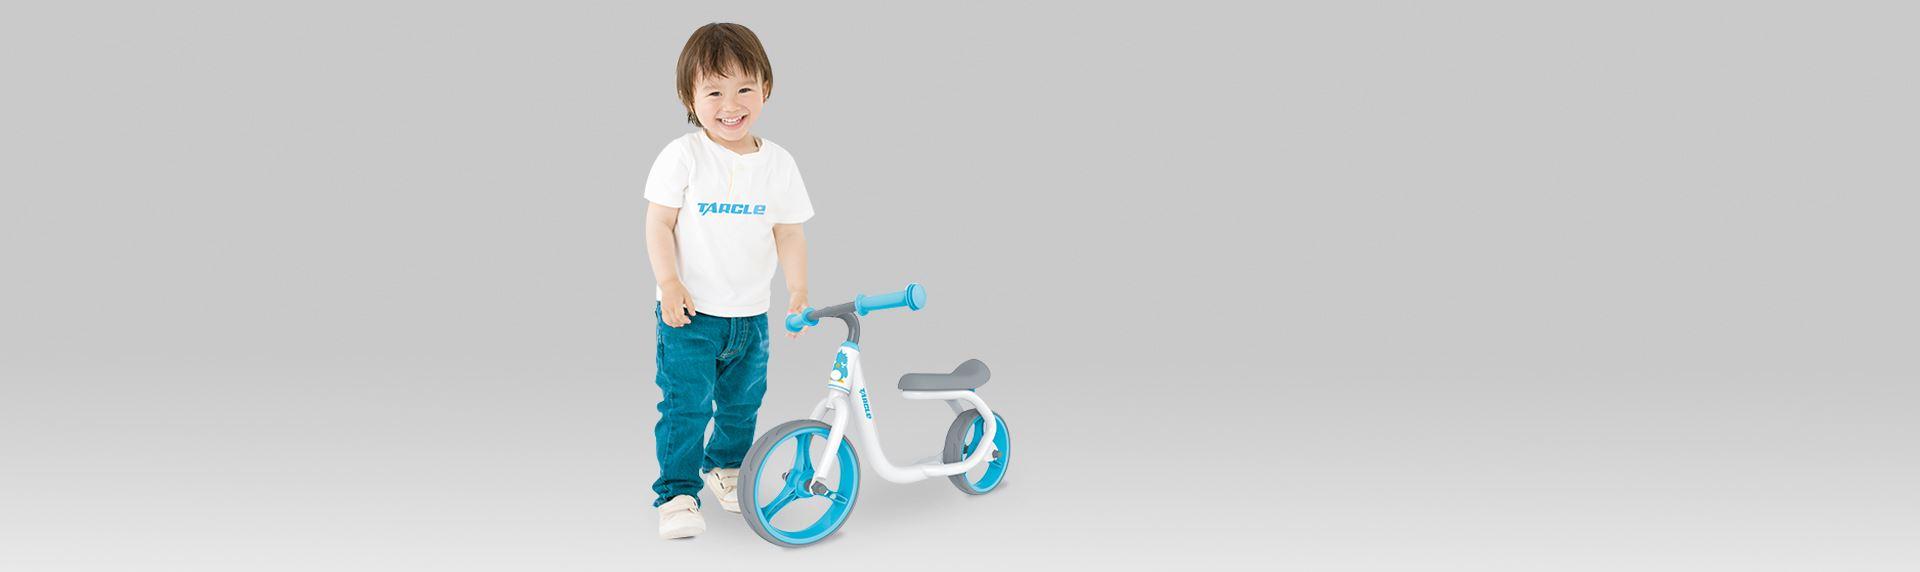 CMM新闻-踏客儿童滑步车